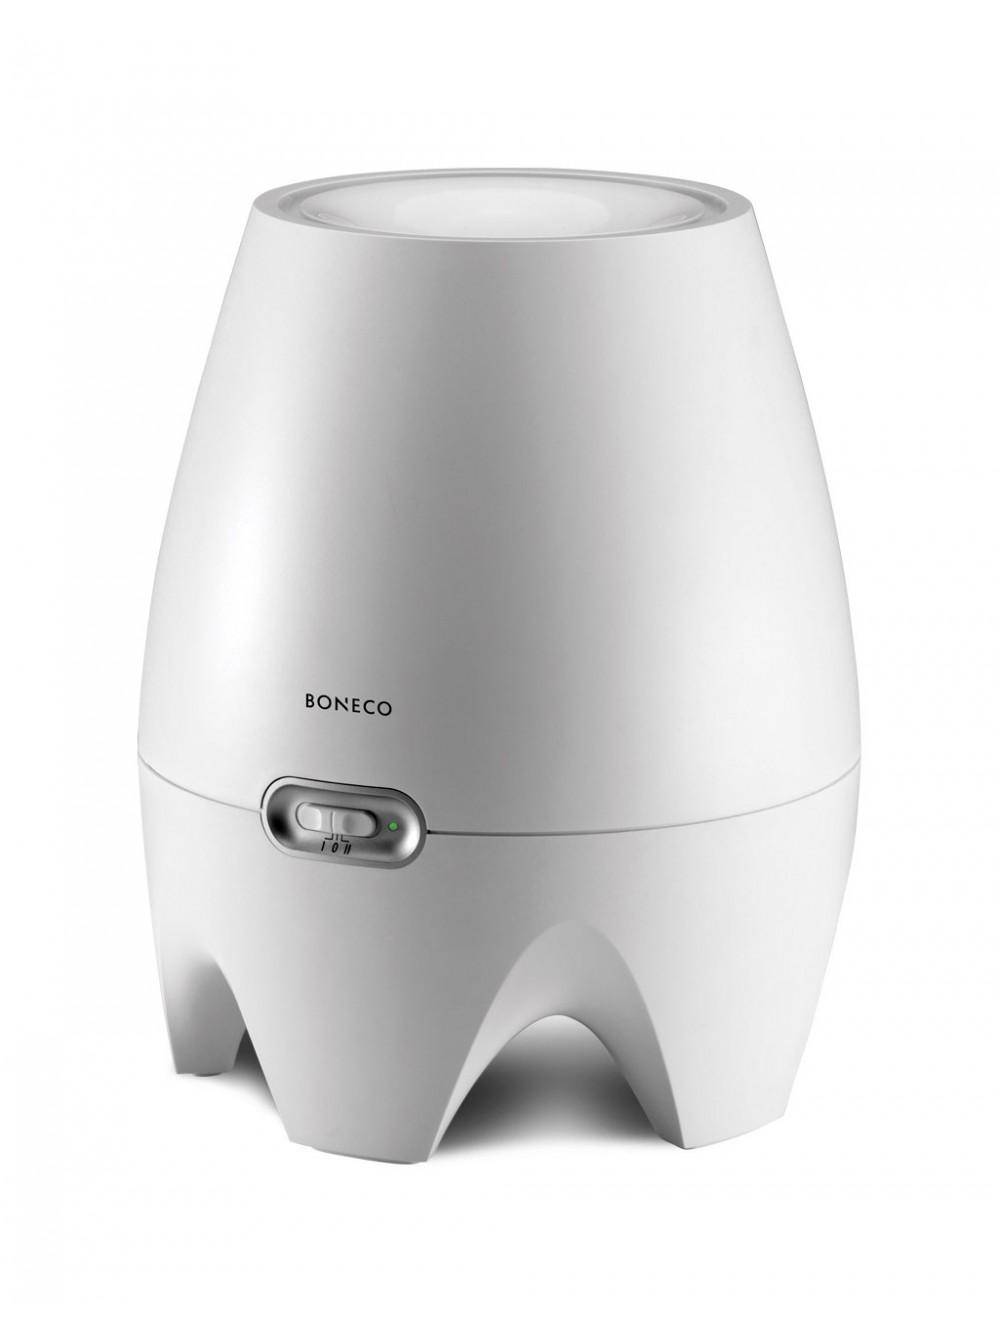 Увлажнитель воздуха Boneco Air-O-Swiss E2441A-white